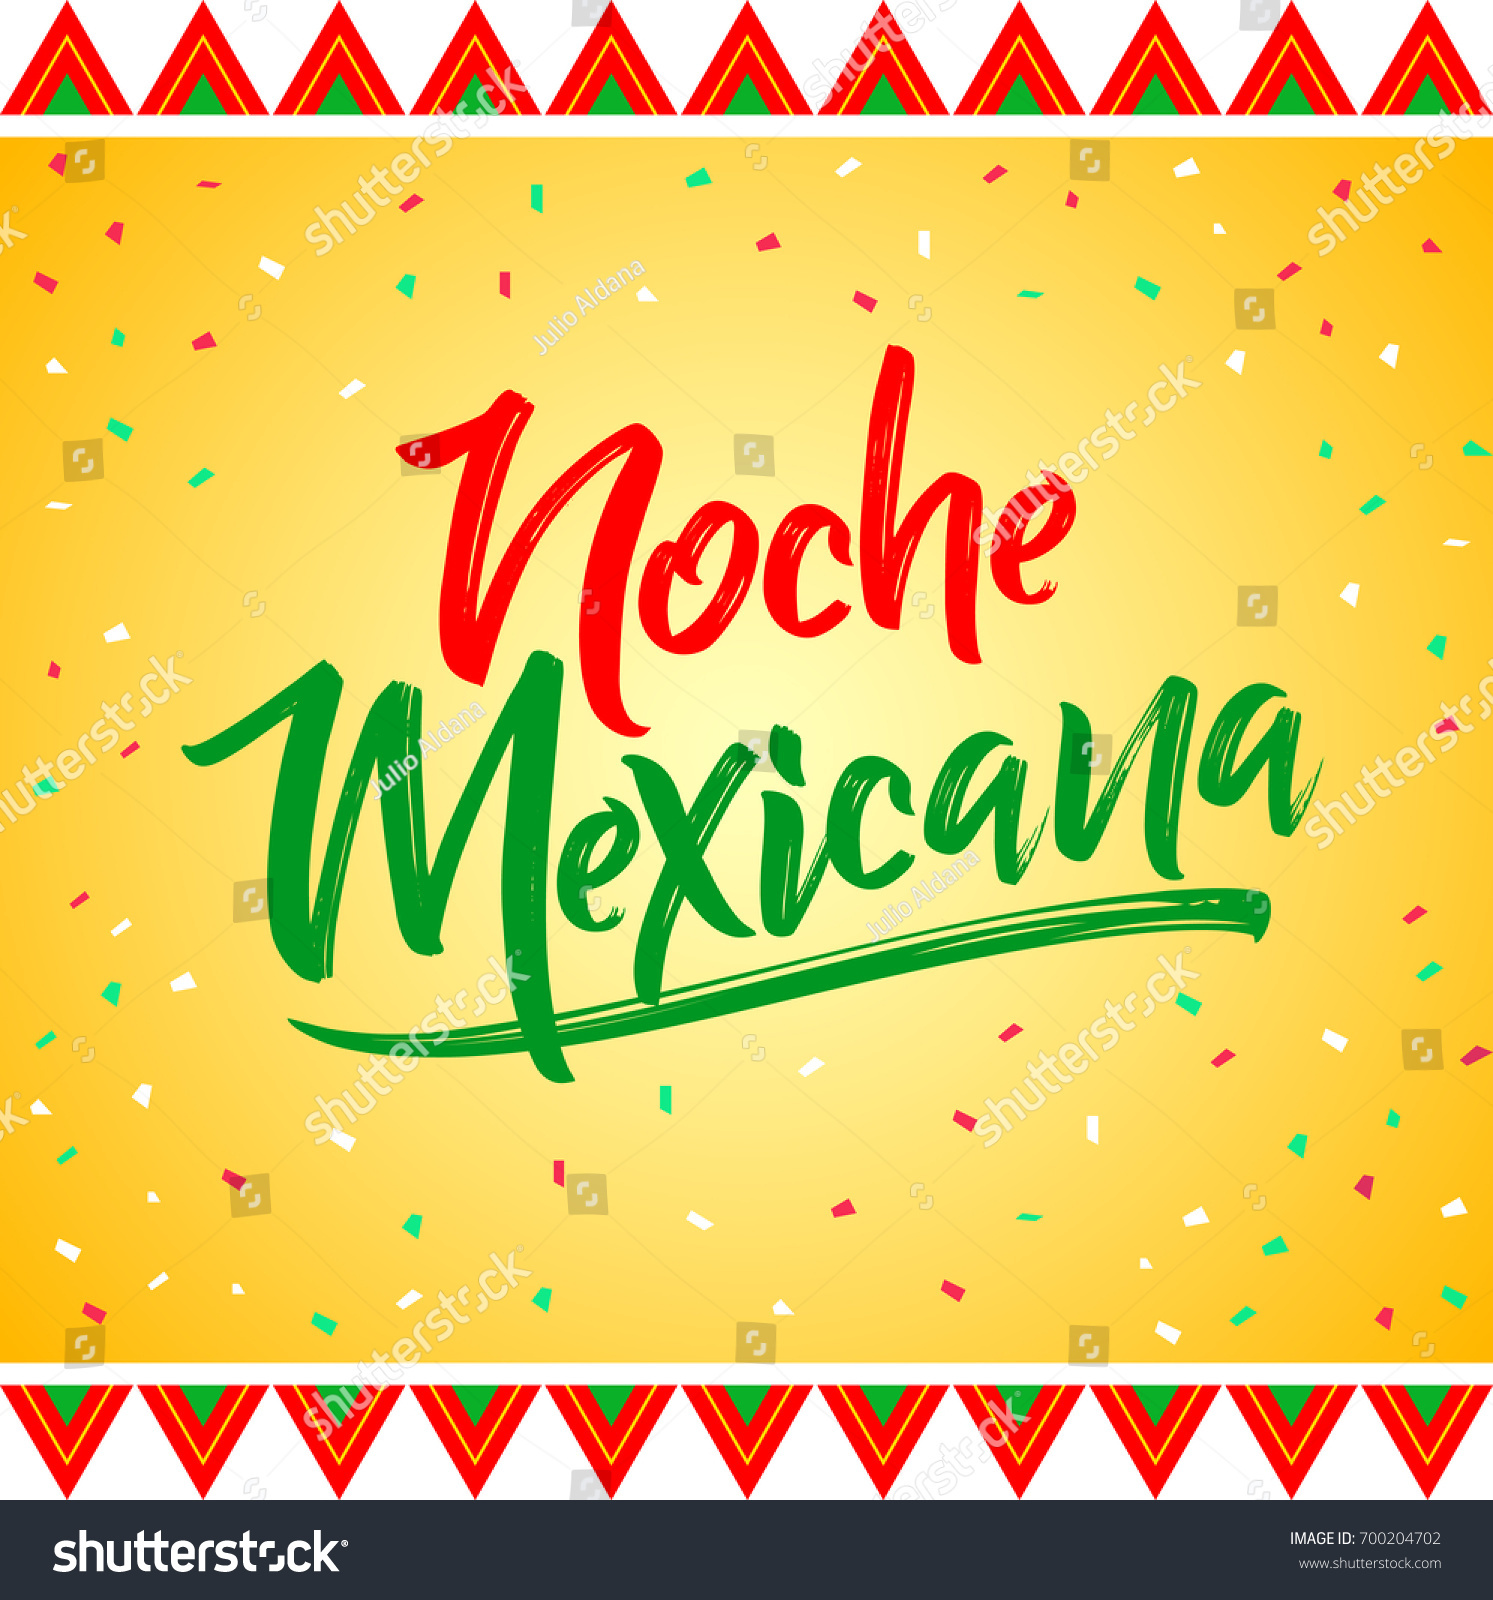 Noche Mexicana Mexican Night Spanish Text Stock Vector